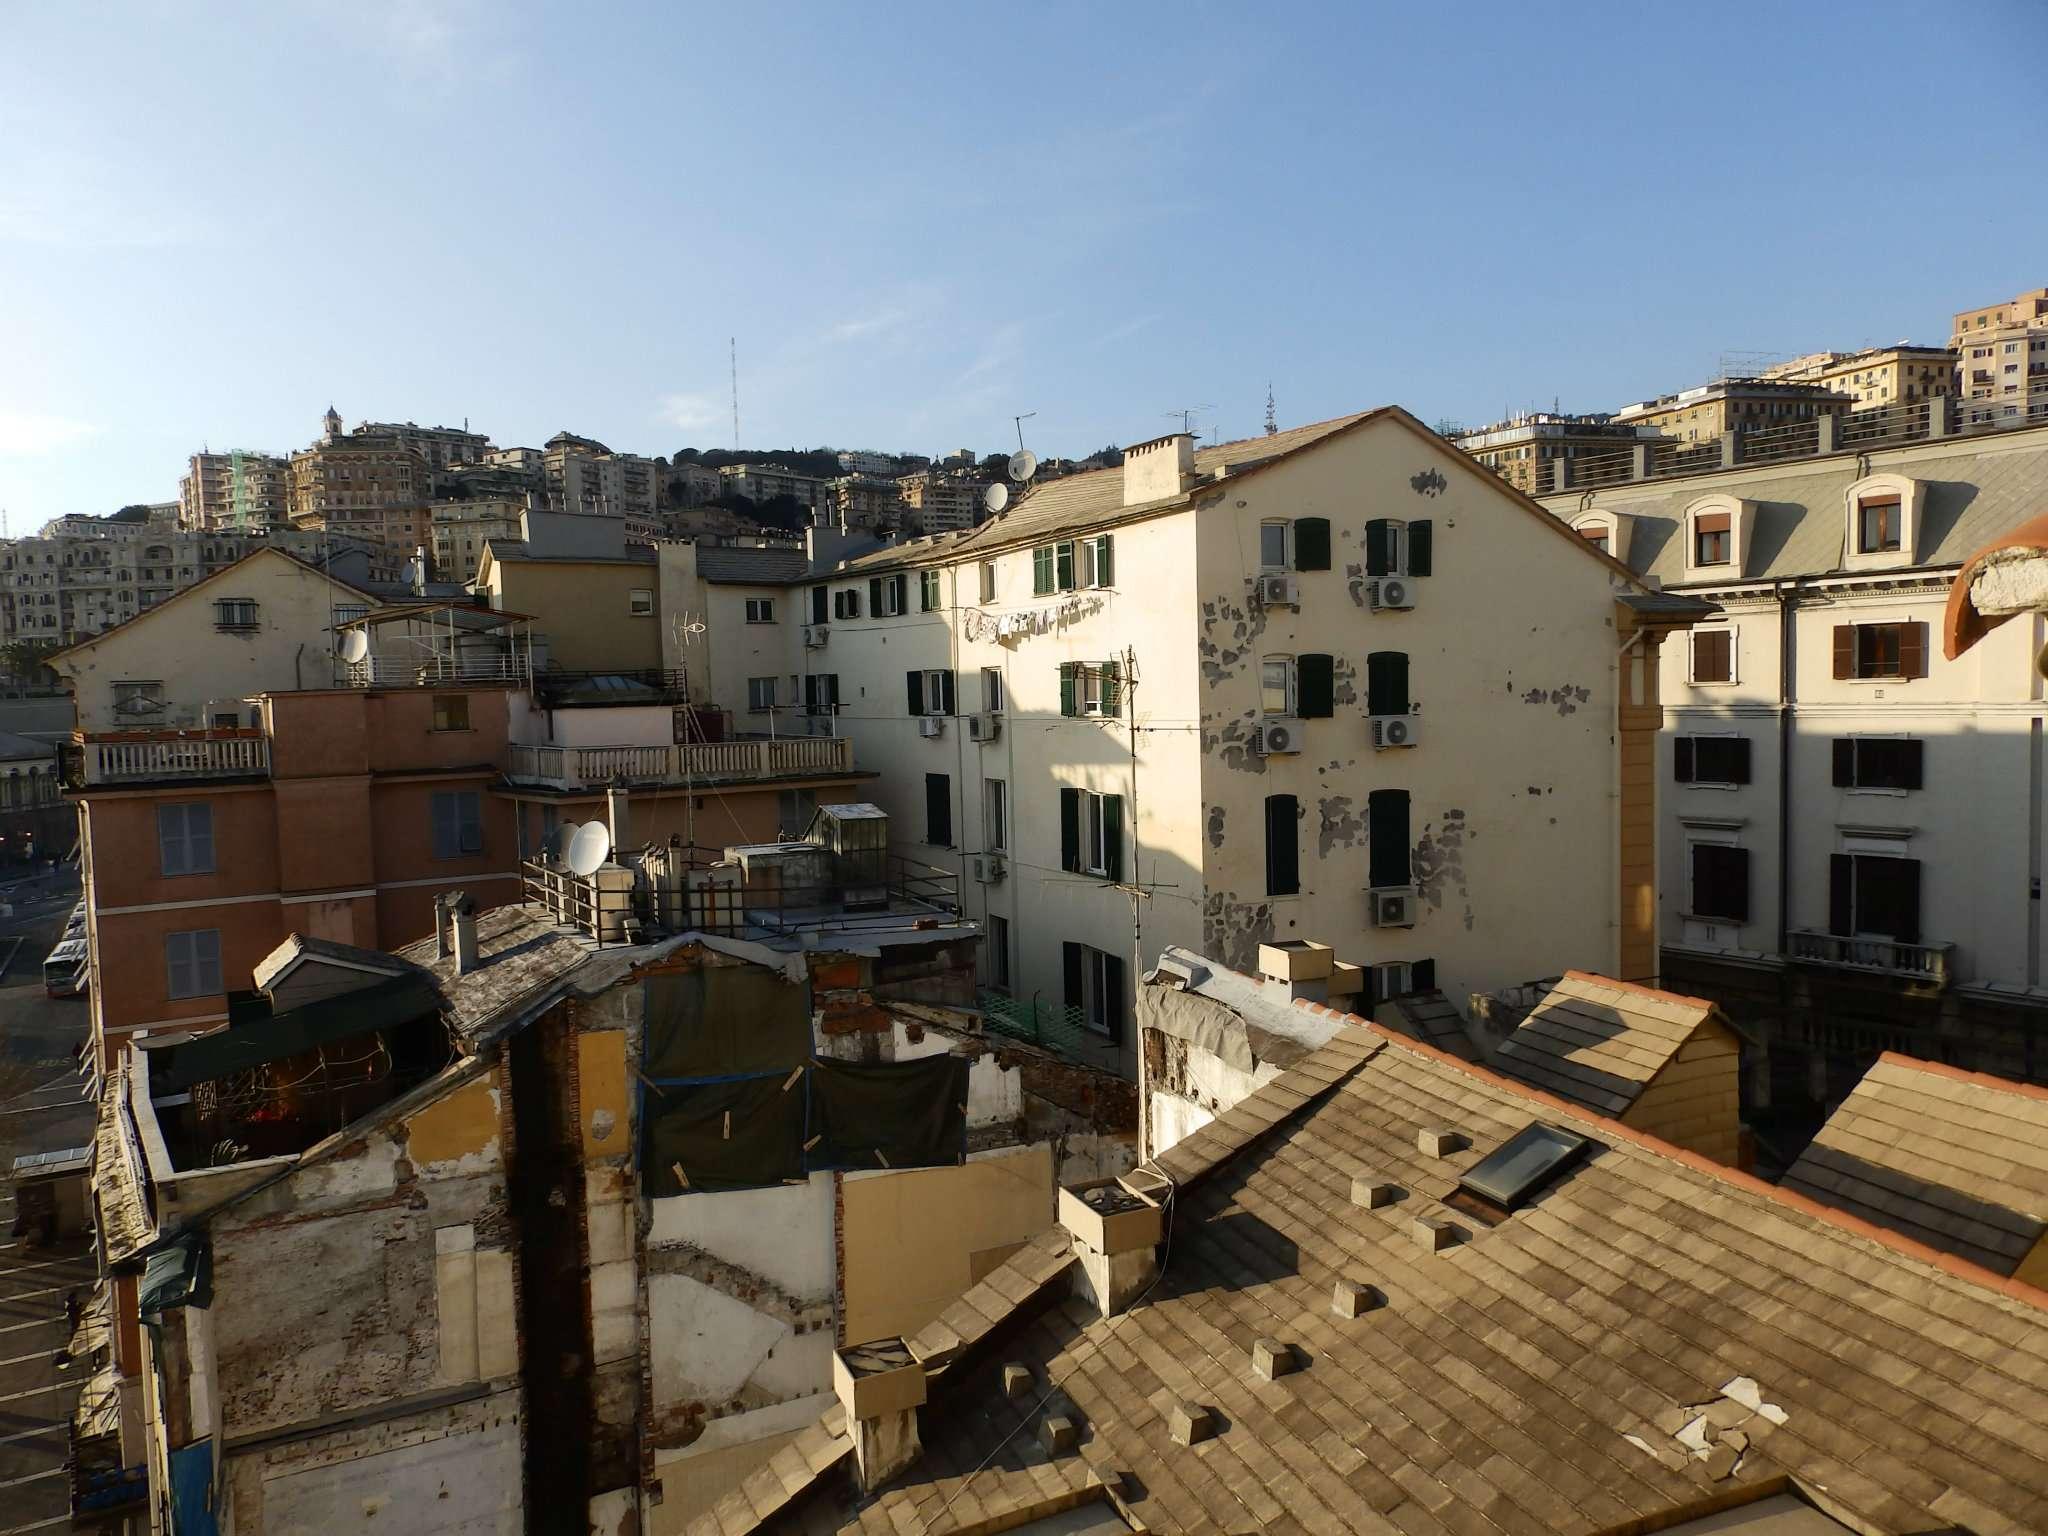 Bilocale Genova Salita San Paolo 3